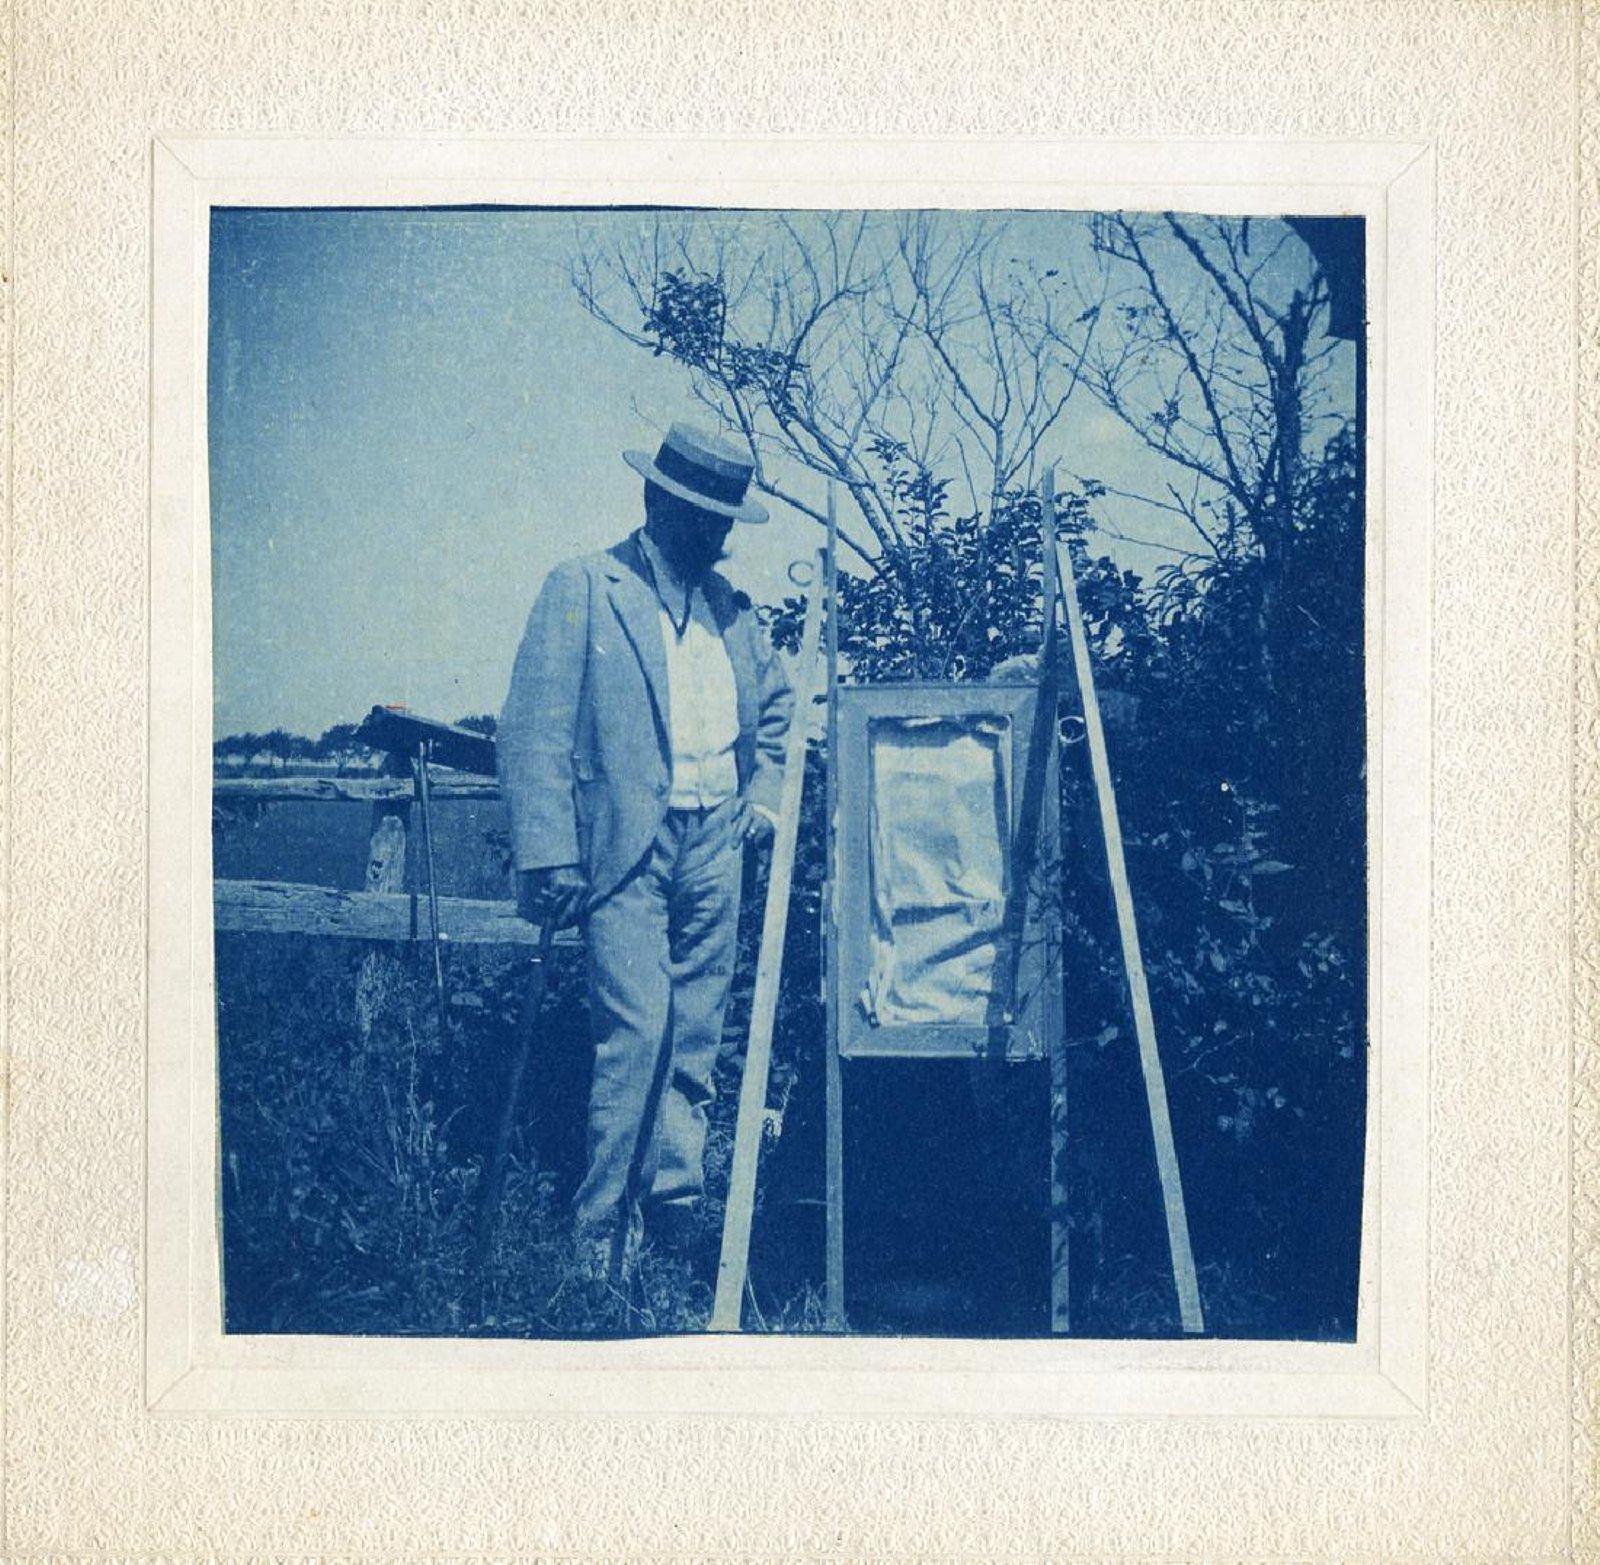 4 Cyanotypes of William Merritt Chase's Classes at Shinnecock Hills, Long Island